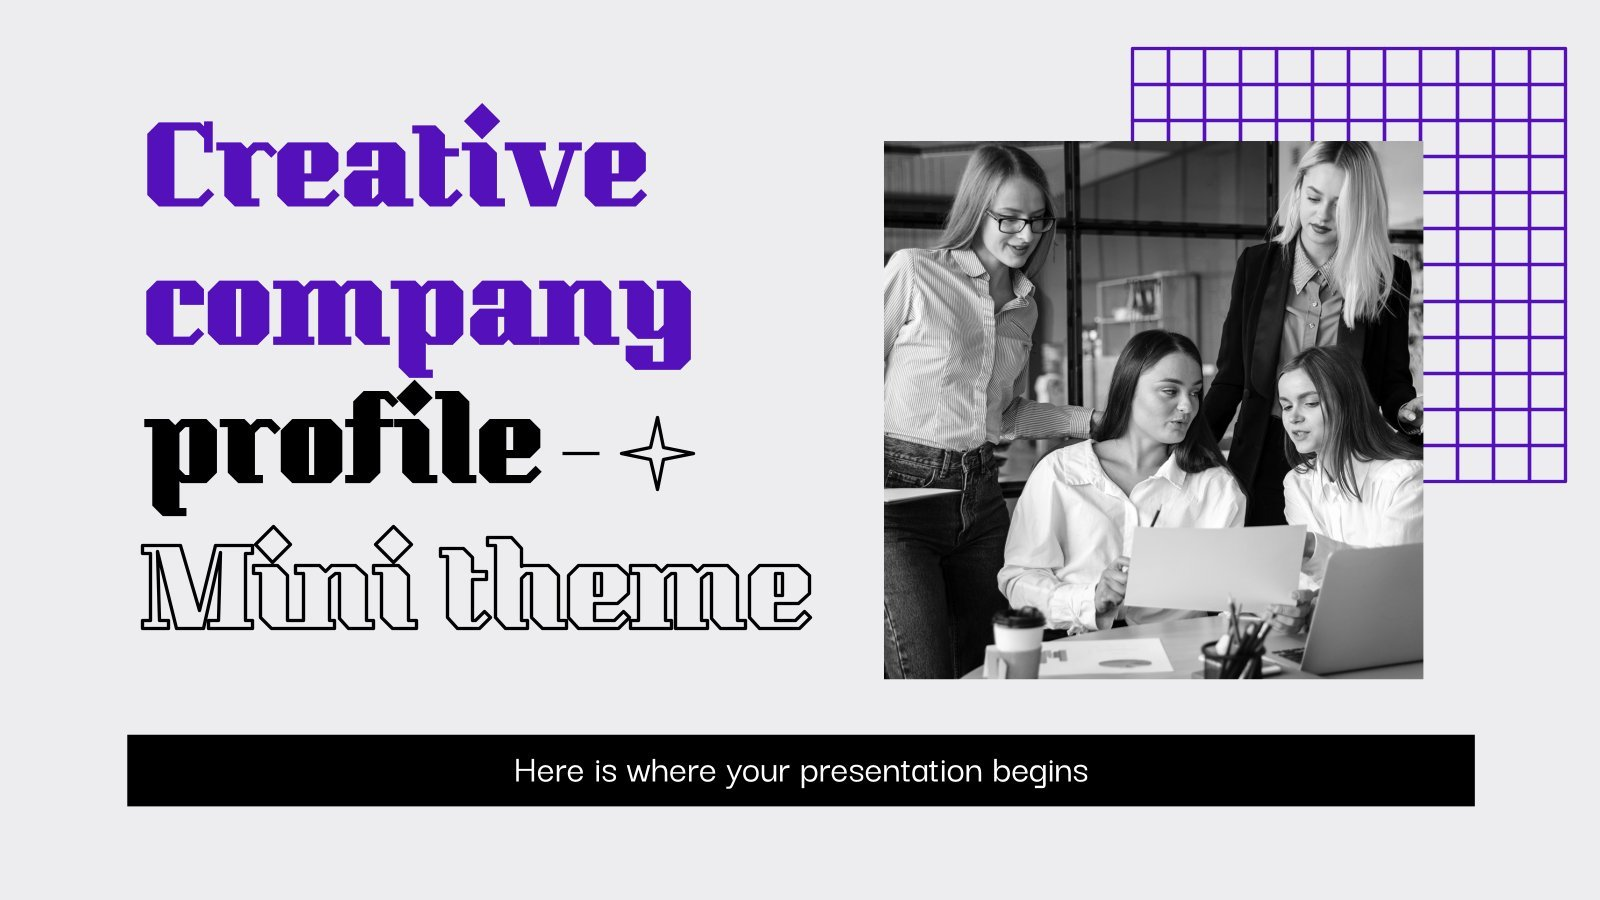 Creative Company Profile Minitheme presentation template